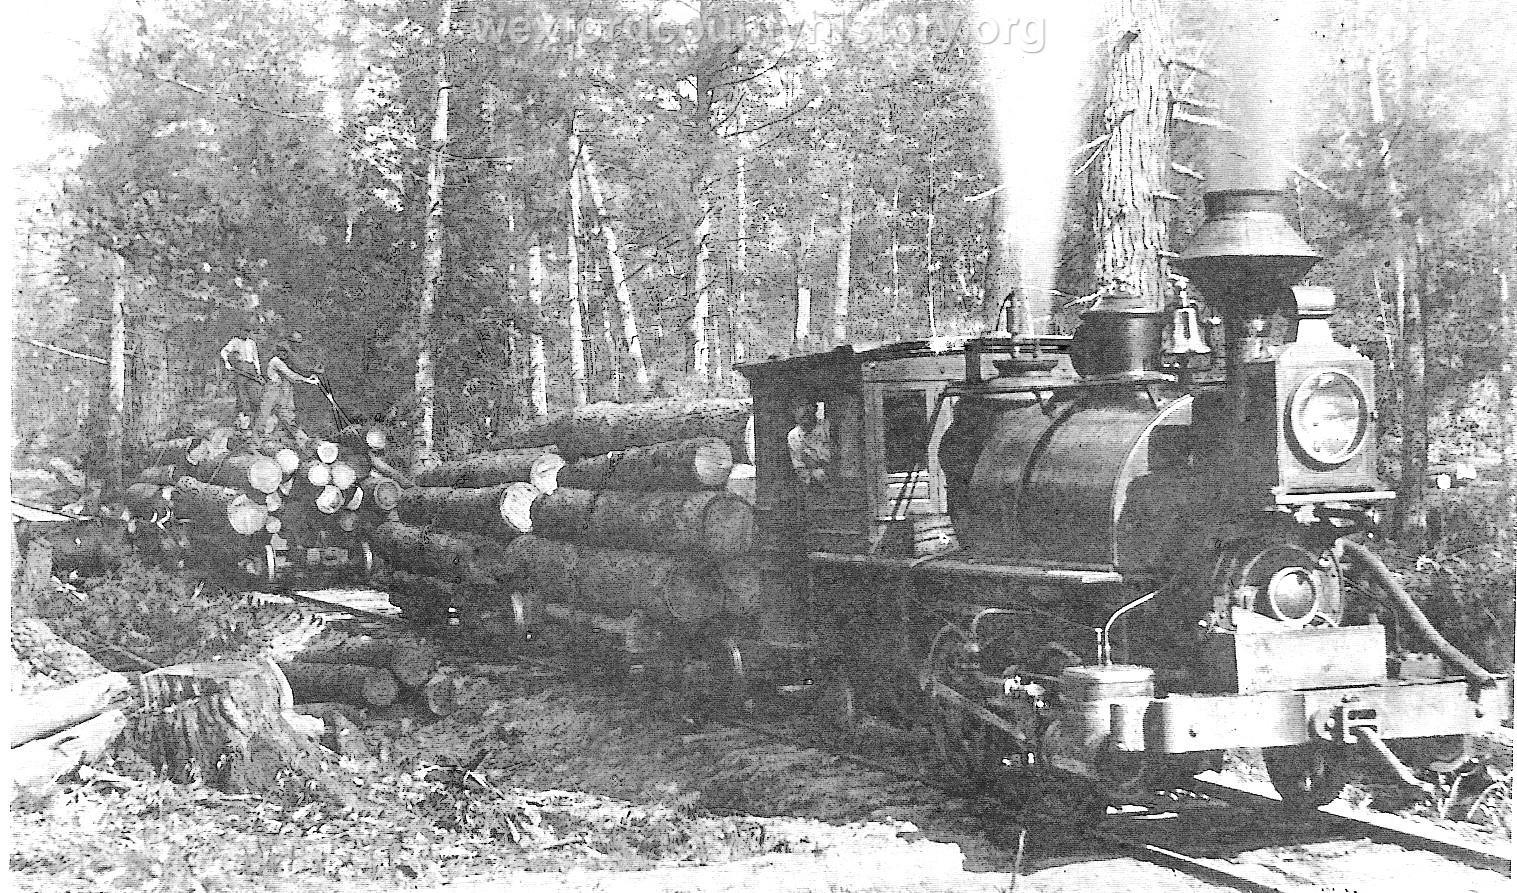 Cadillac-Railroad-Cummer-Lumber-Compnay-Shay-Locomotive-TR1ts749